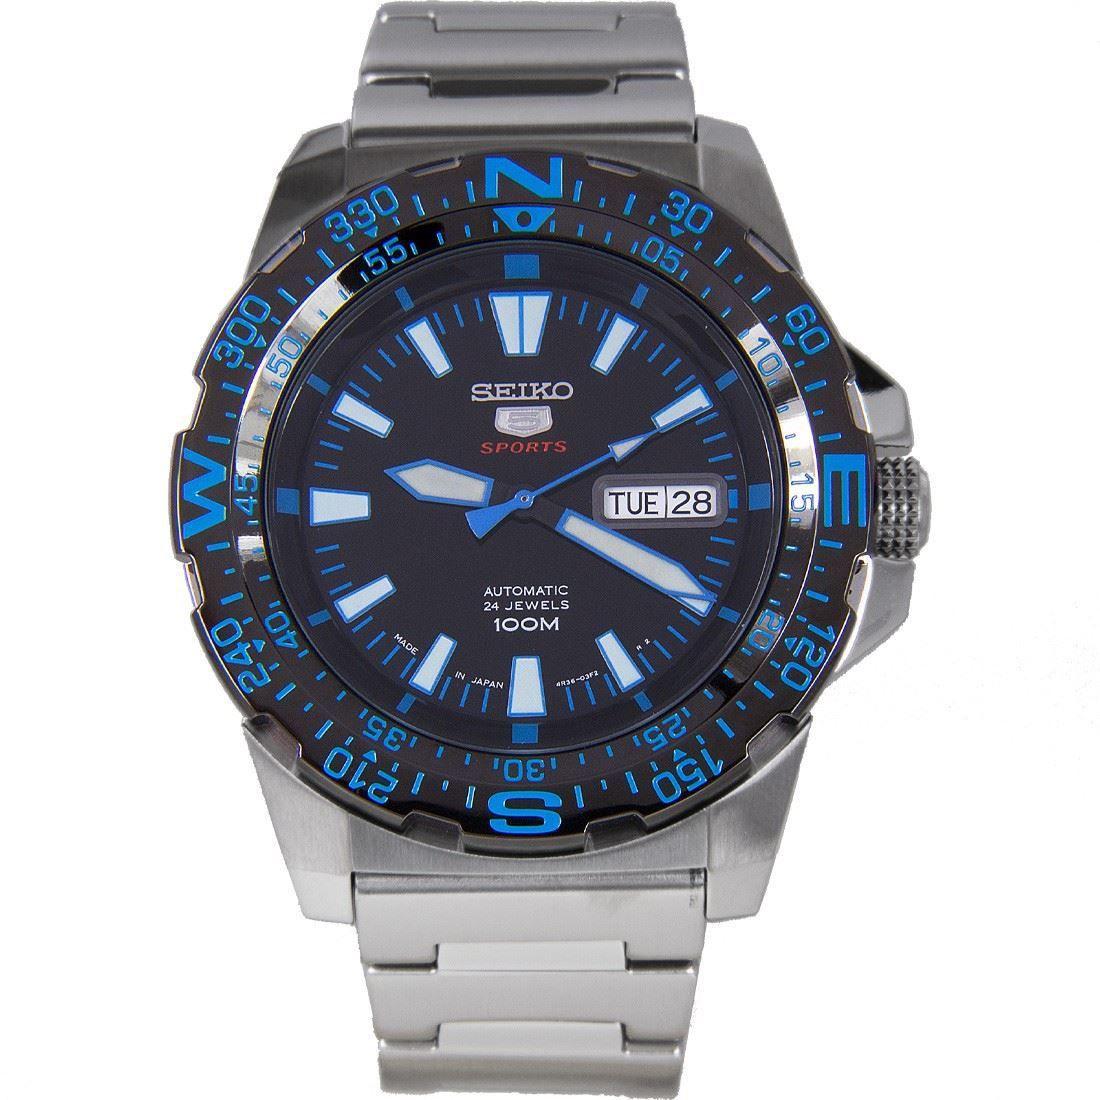 SRP543J1 SRP543 Seiko 5 Sports Automatic Watch Seiko 5